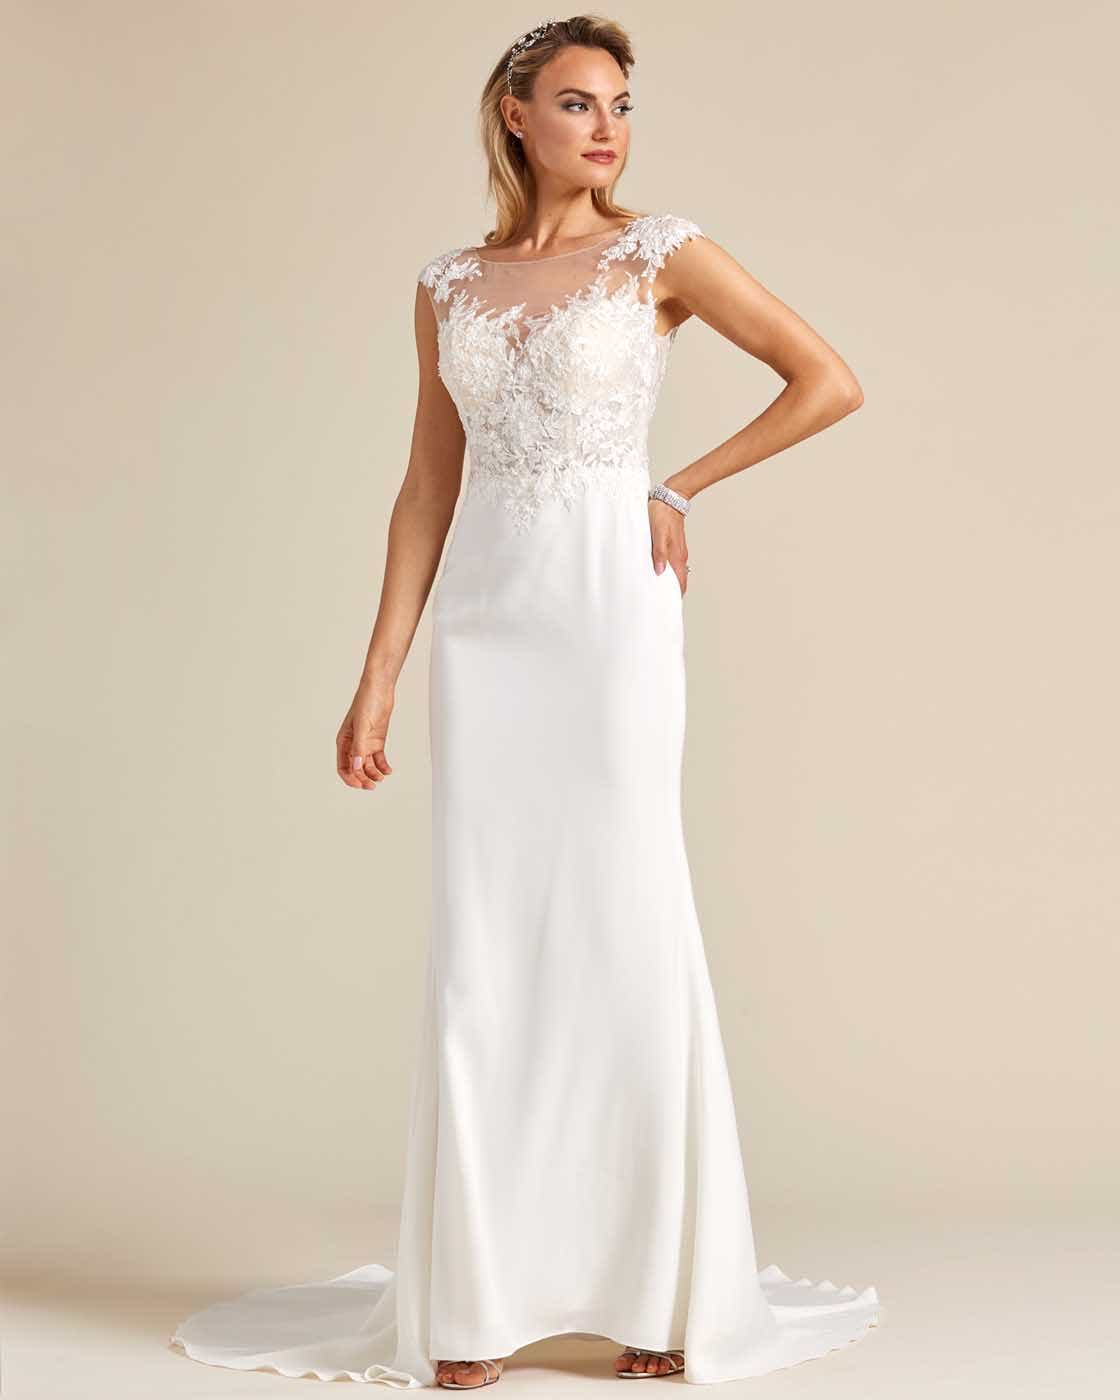 Cream White Button Down Back Wedding Dress - Front